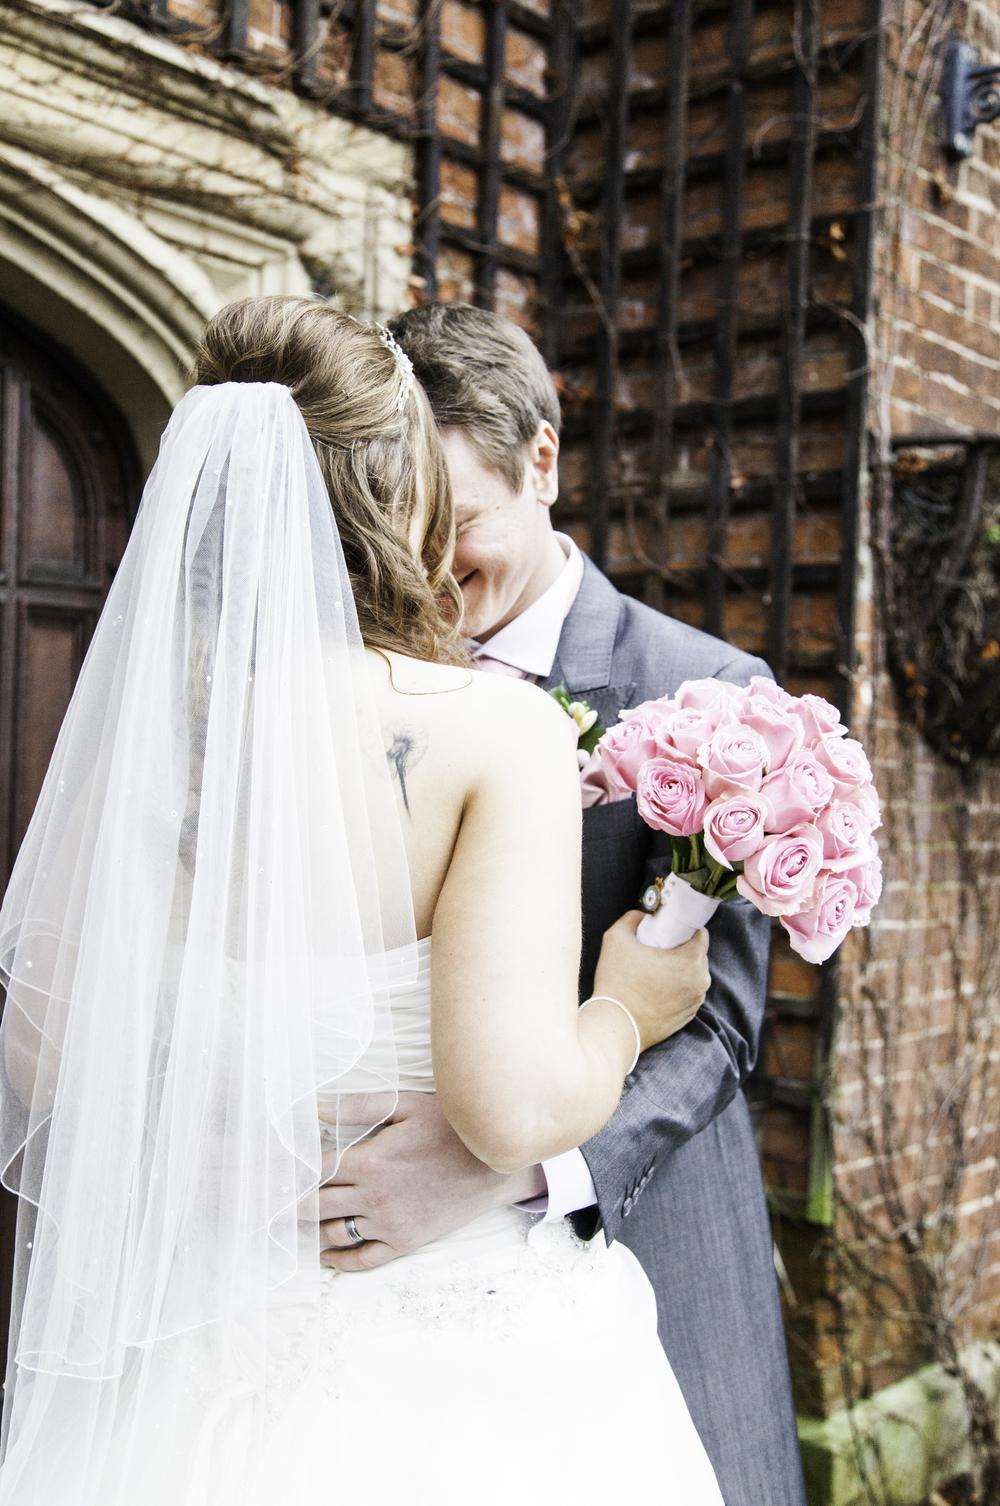 Venue: The Villa - UK Wedding Photography - Nicolette Spelic Photography